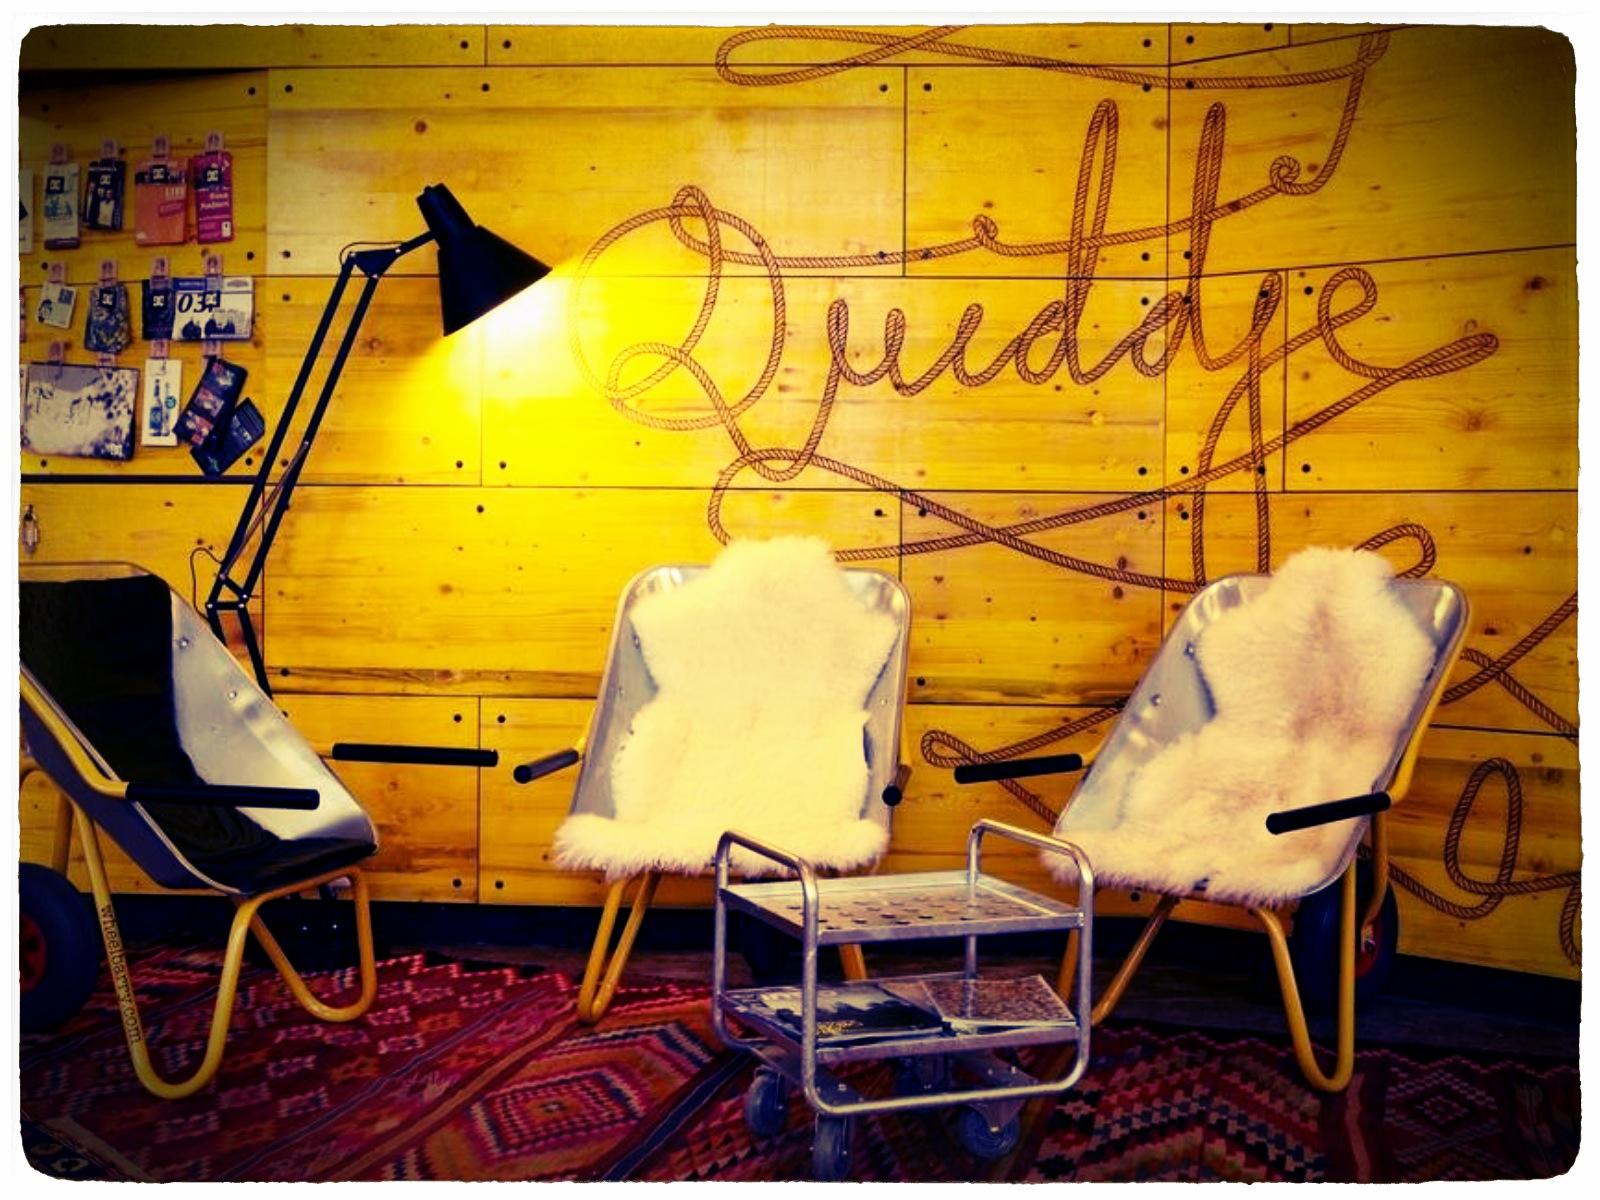 Quiddje-72-dpi.jpg